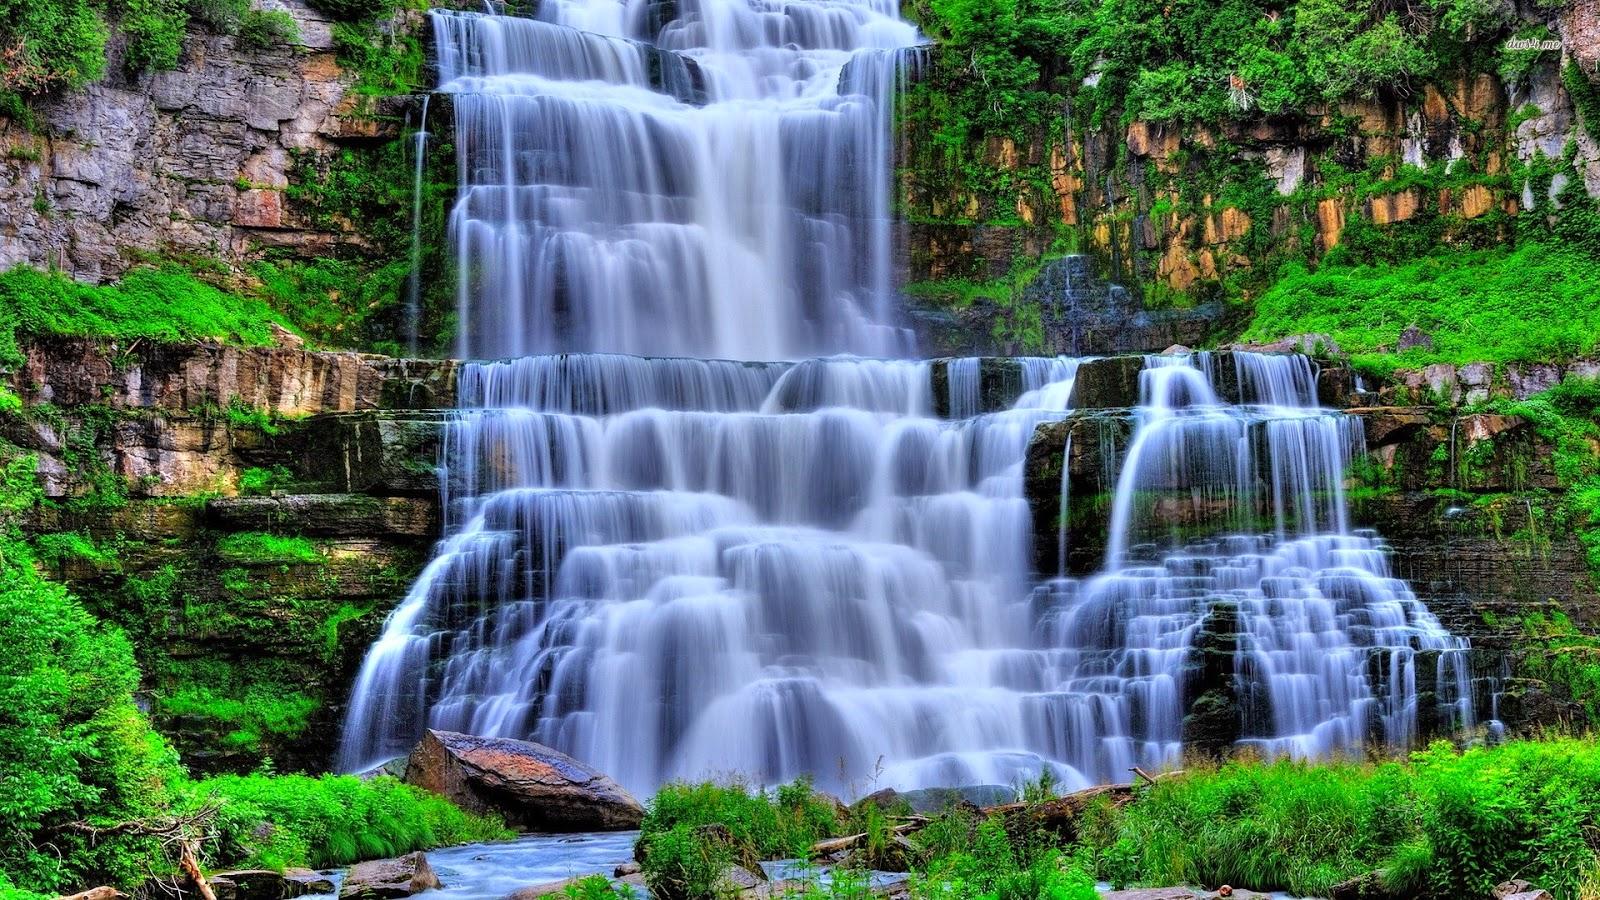 Most Beautiful Waterfall Wallpaper Picserio Nature Waterfall Hd Wallpaper Background 1600x900 Wallpaper Teahub Io